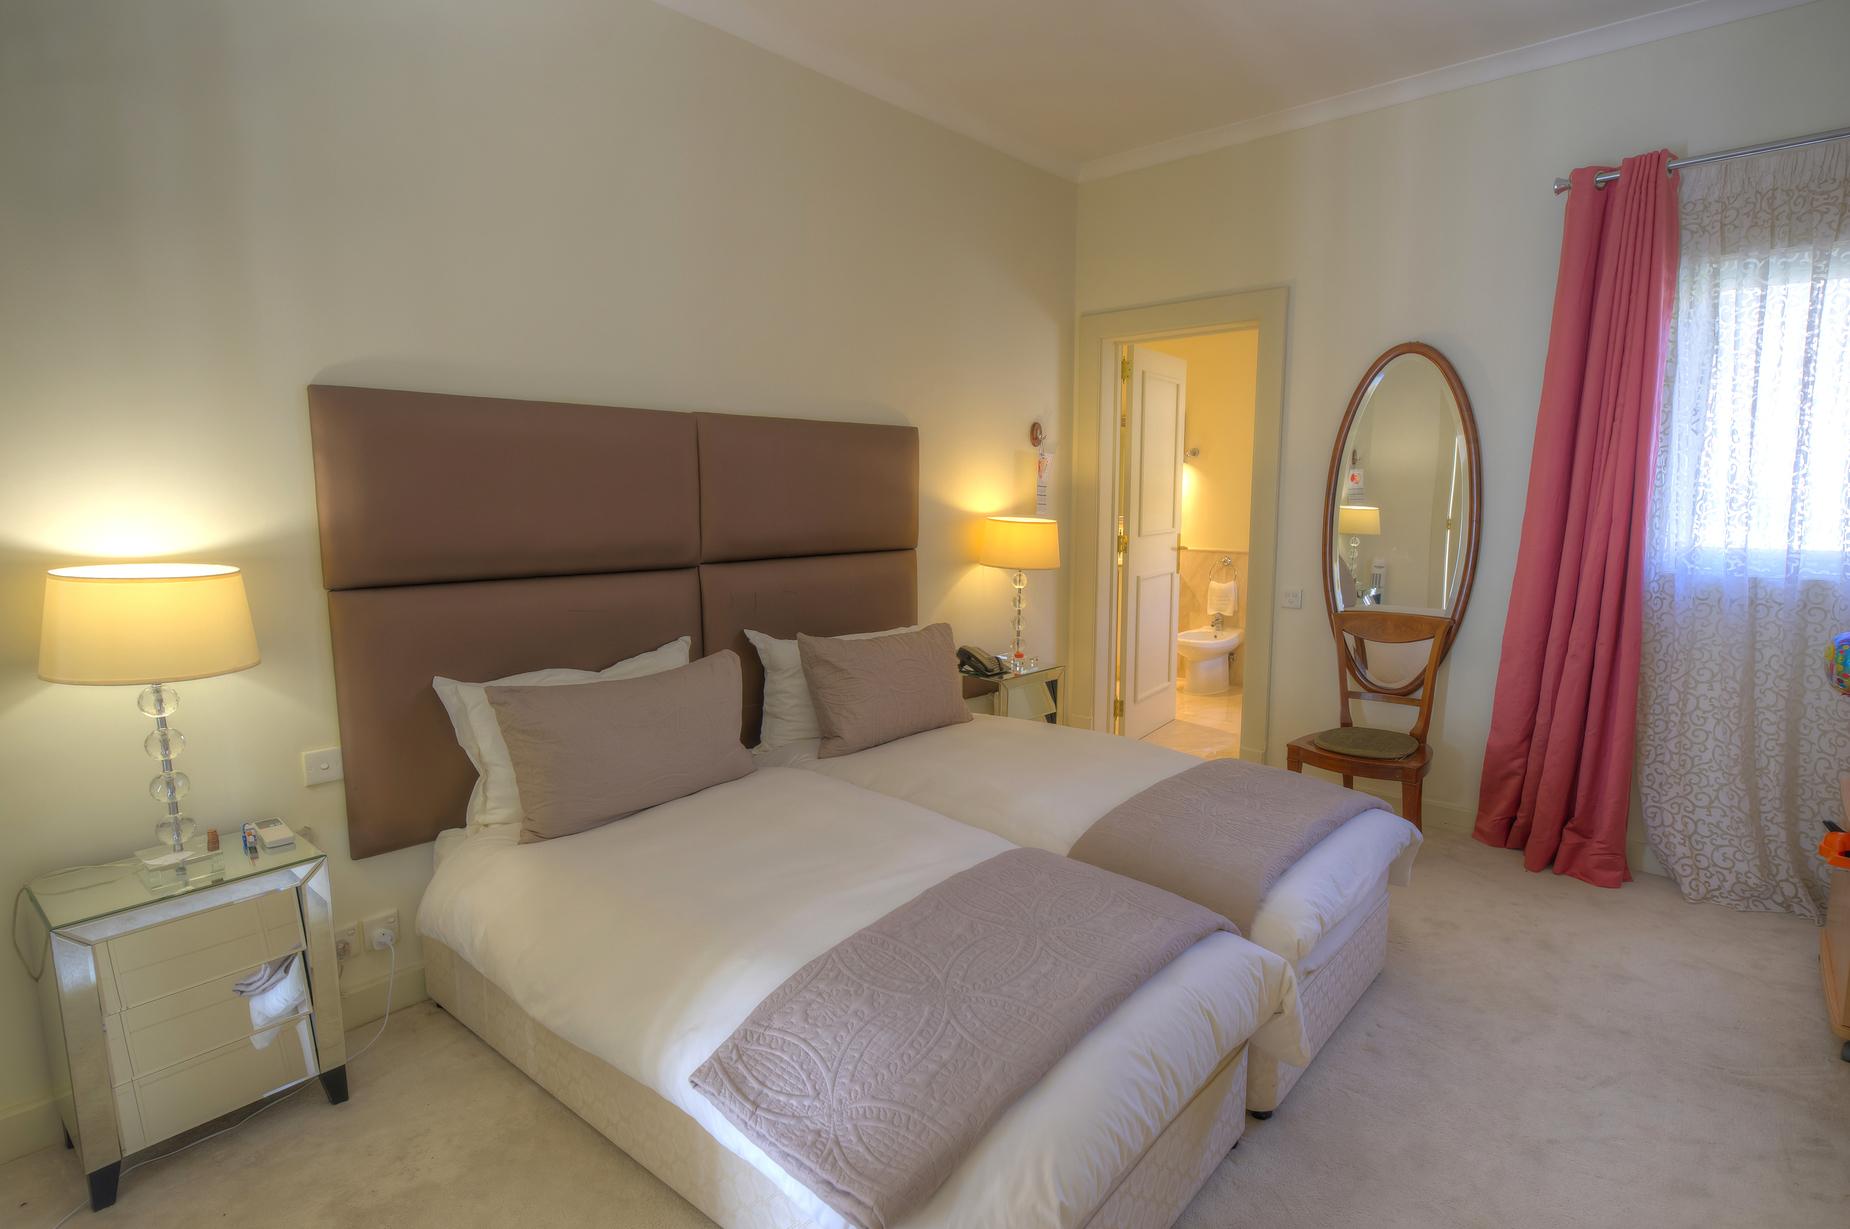 4 bed Villa For Rent in Iklin, Iklin - thumb 18